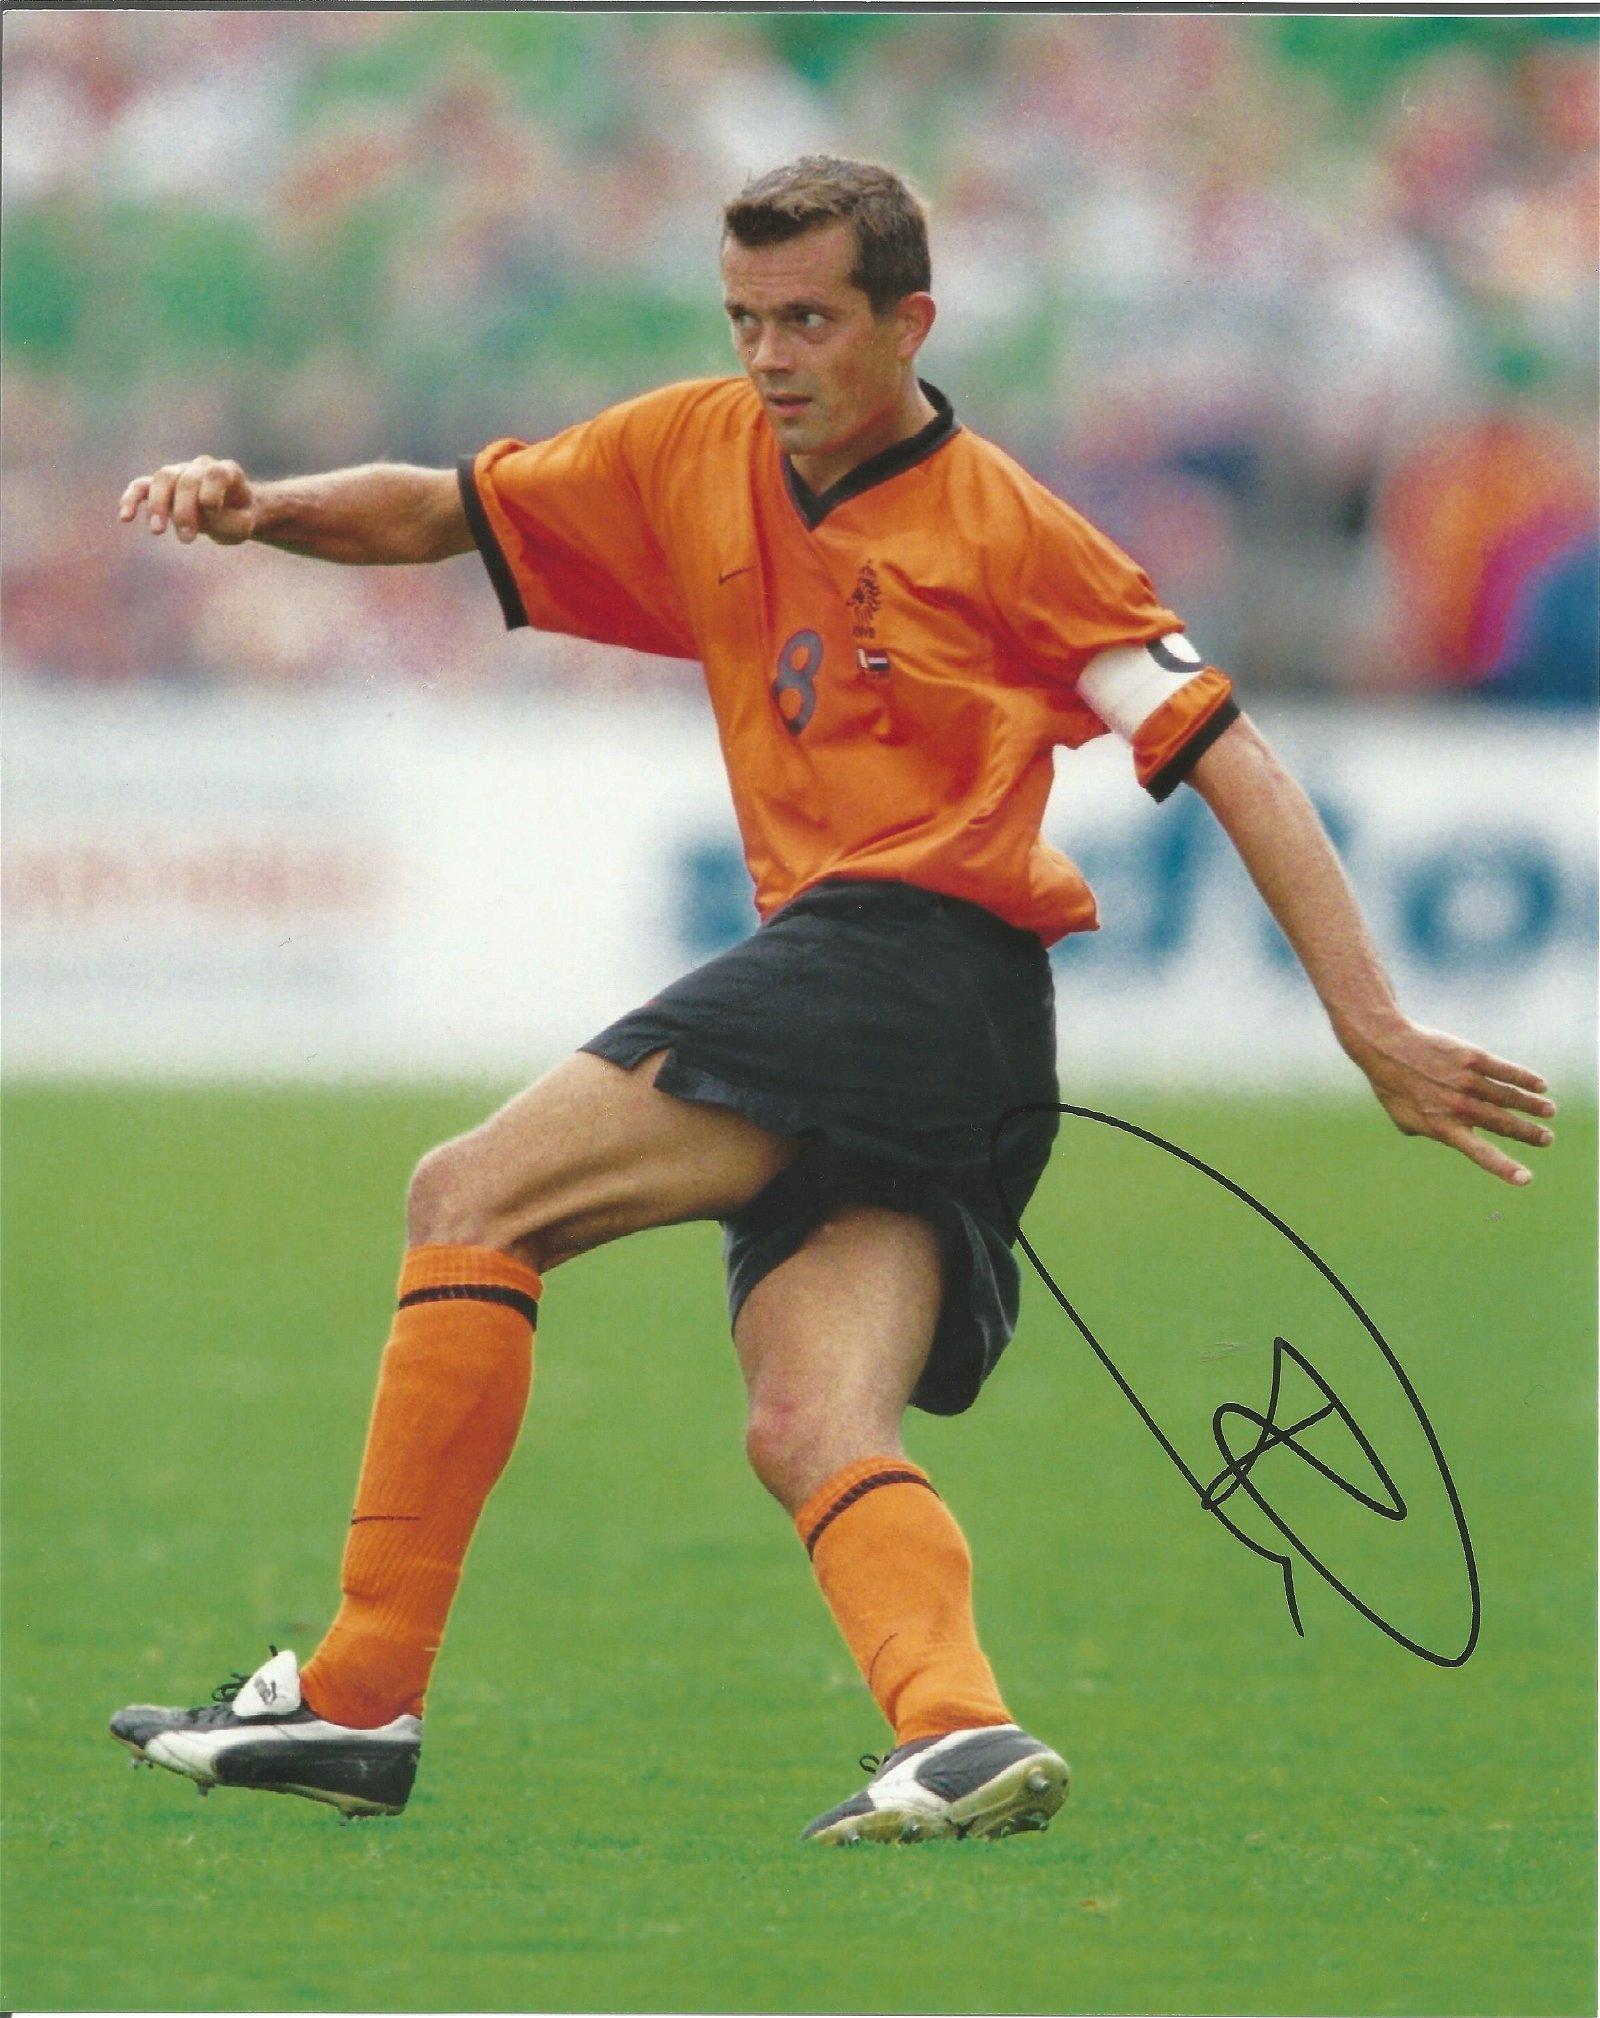 Phillip Cocu Signed Holland 8x10 Photo . Good